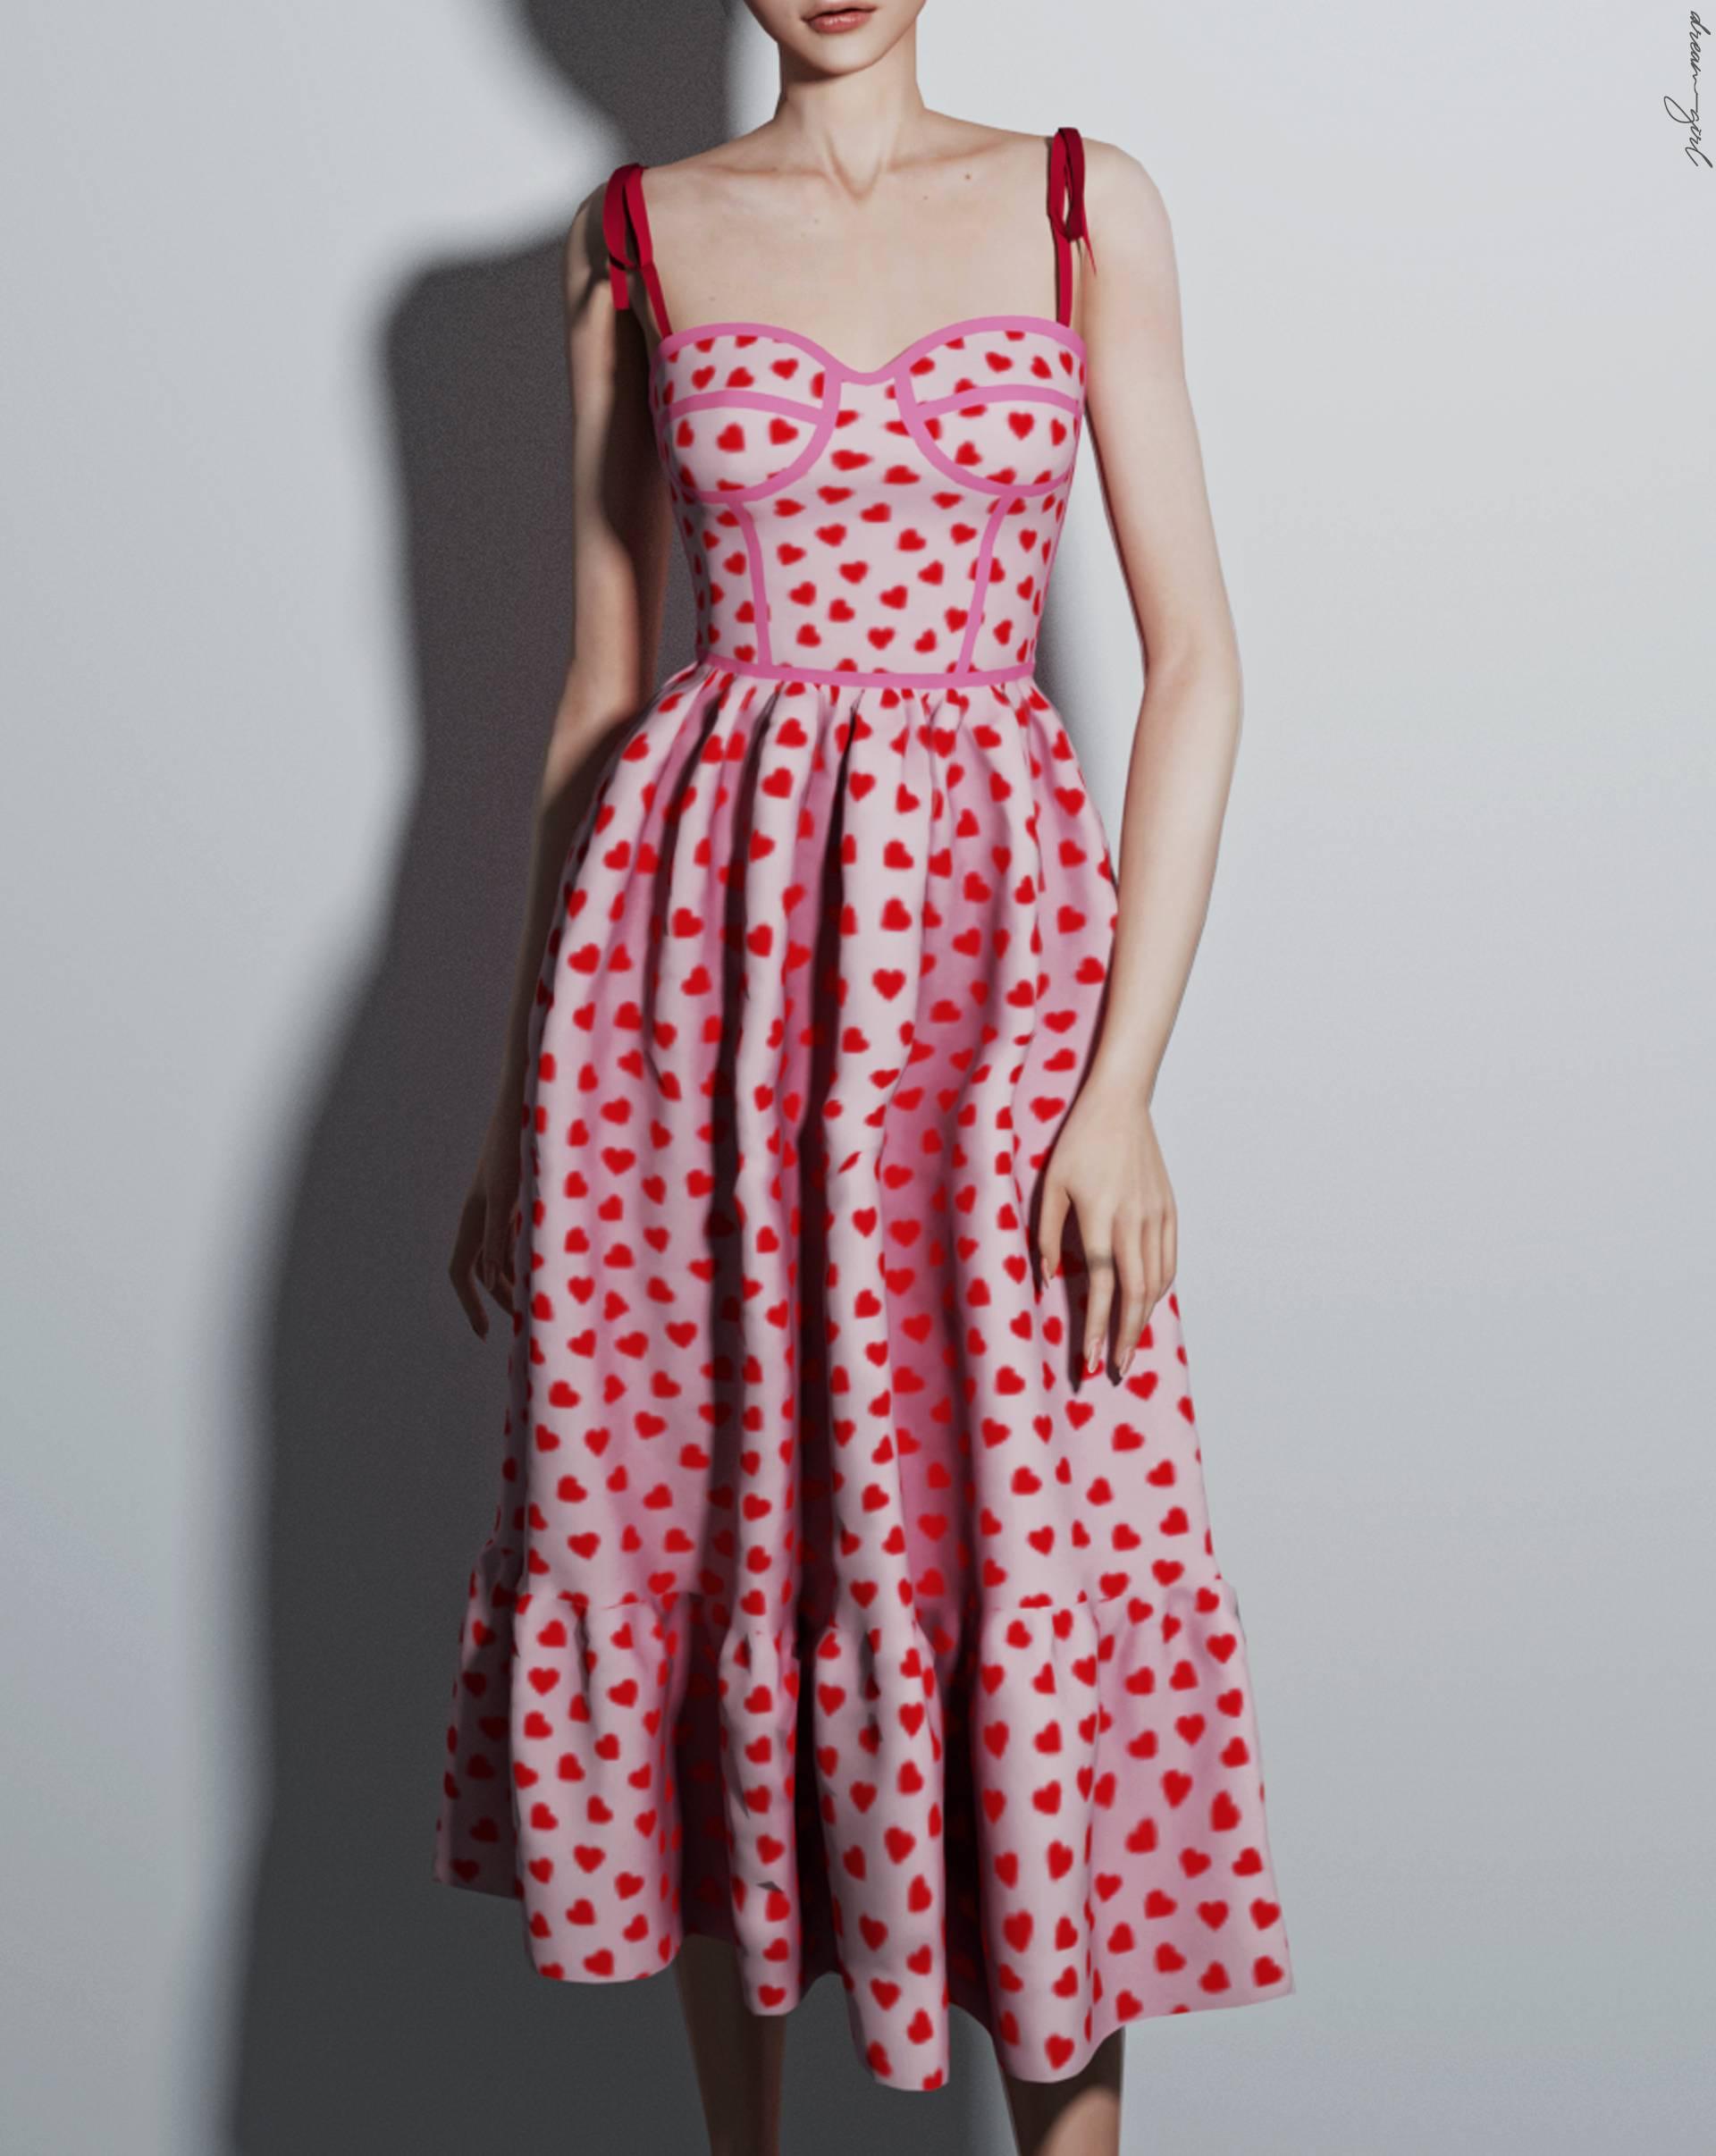 Платье - h e a r t m i d i d r e s s